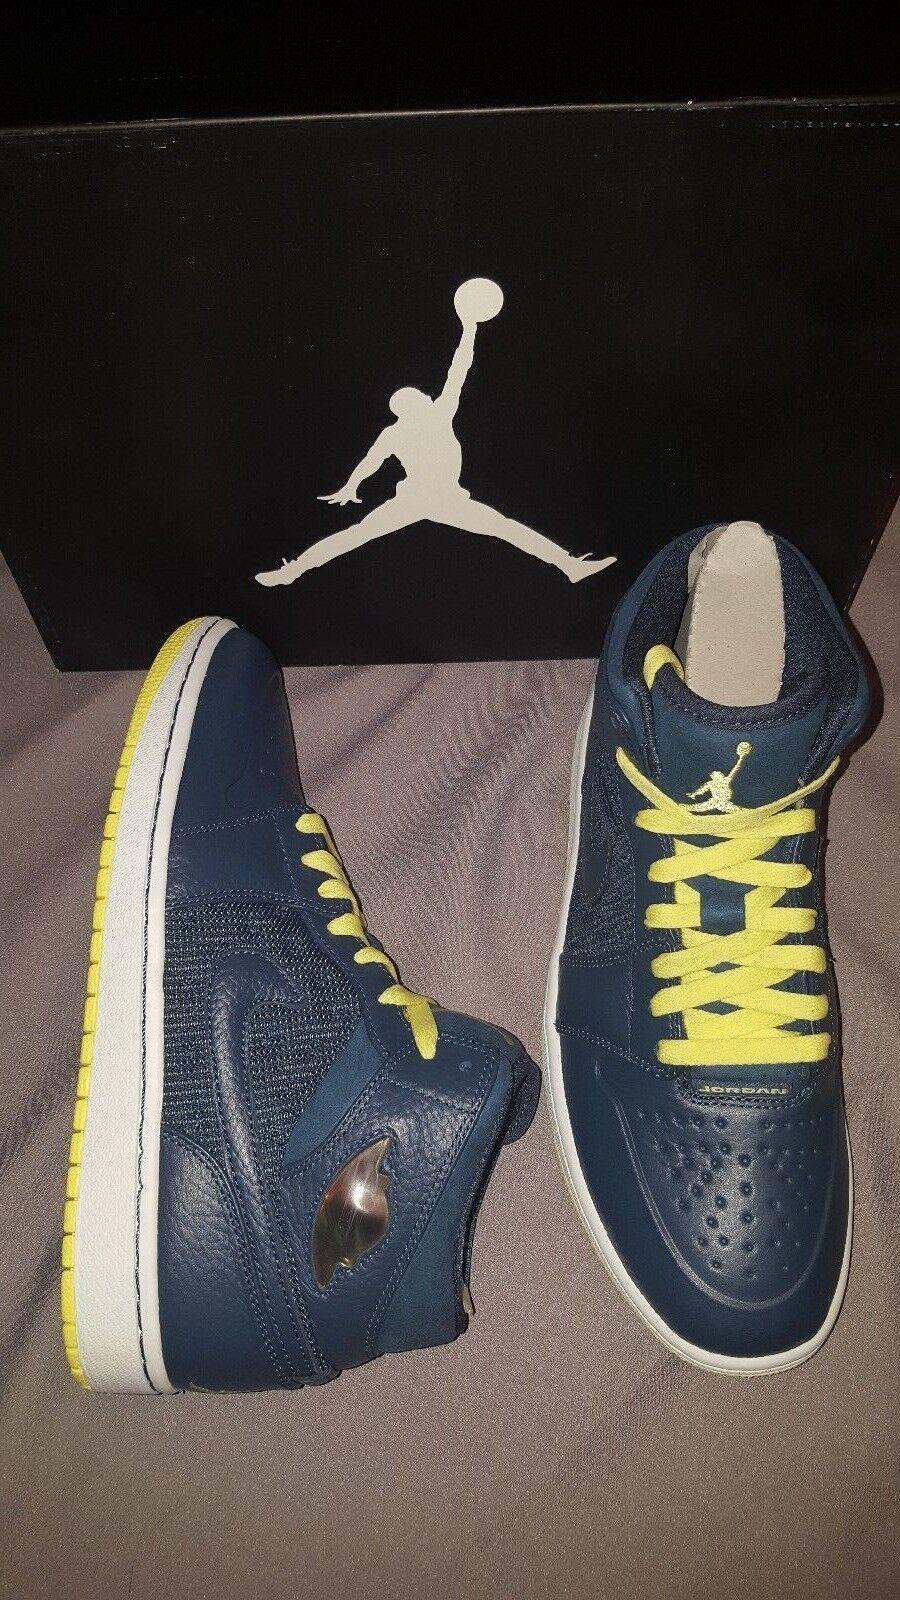 eec49dd43cc NIKE JORDAN 1 RETRO 97 TXT MENS SHOES blueE YELLOW US SIZE 9 555071 445 AIR  nxrvkz1024-Athletic Shoes